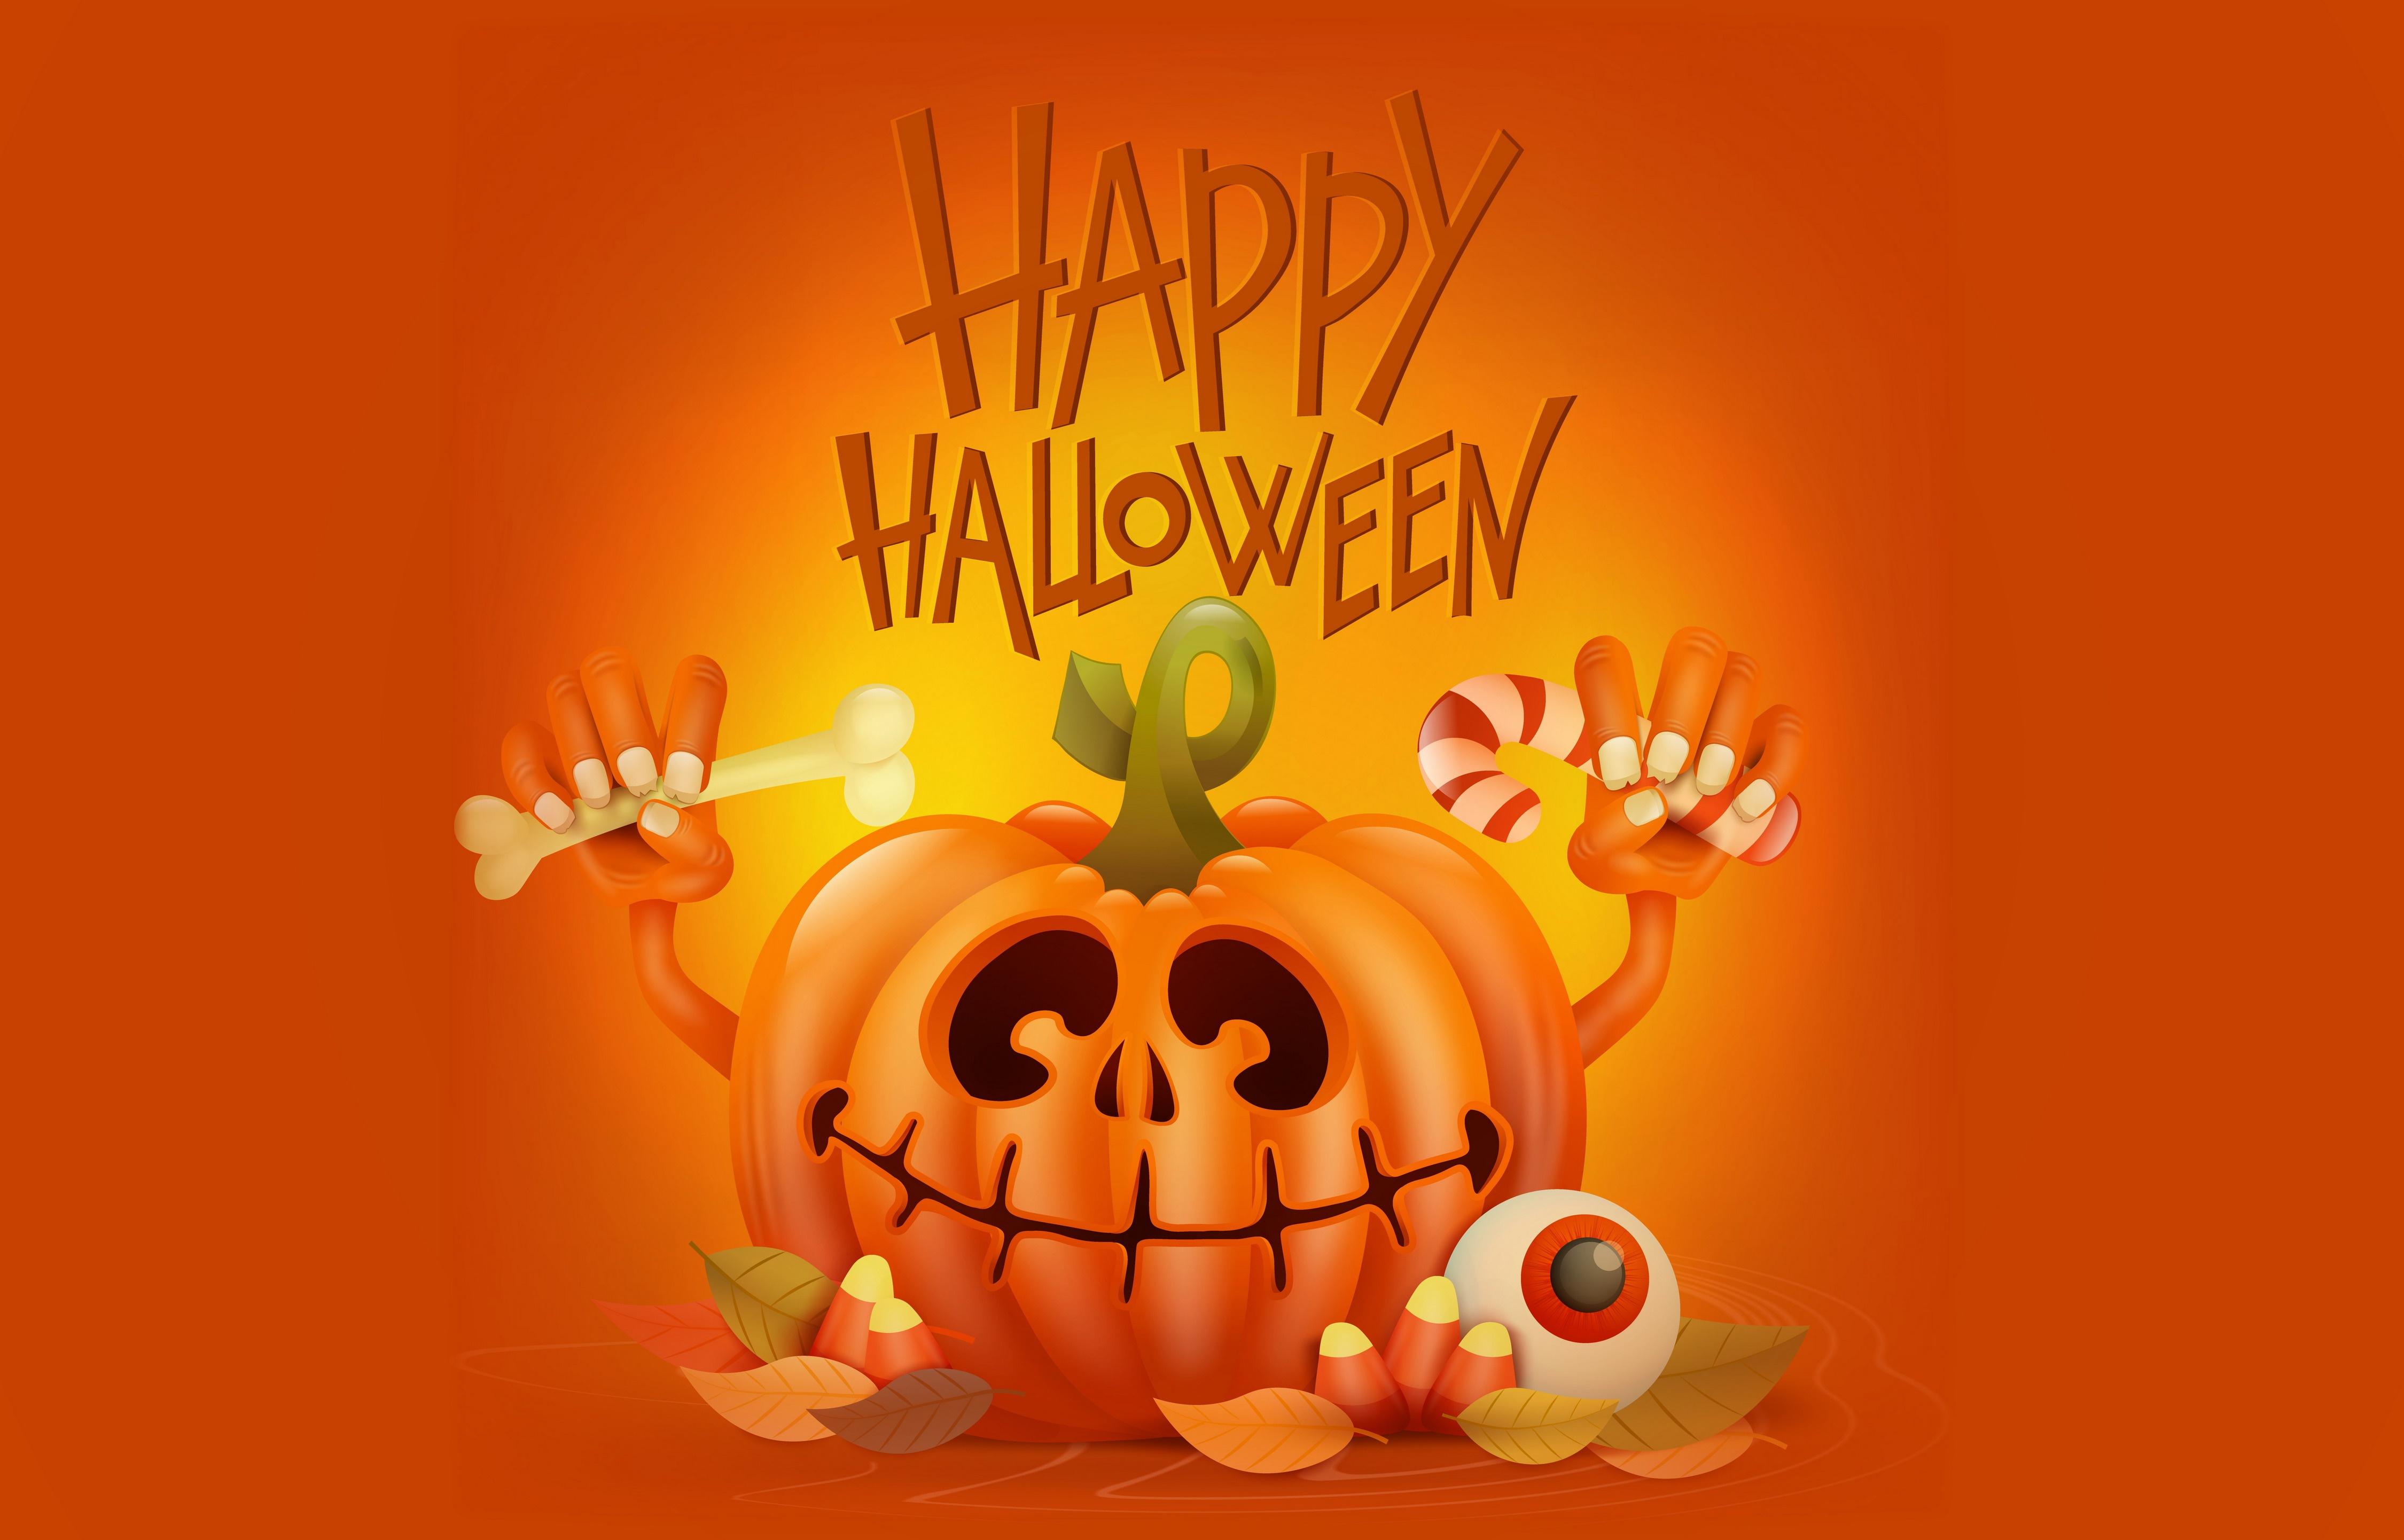 Happy Halloween 4k, HD Celebrations, 4k Wallpapers, Images ...